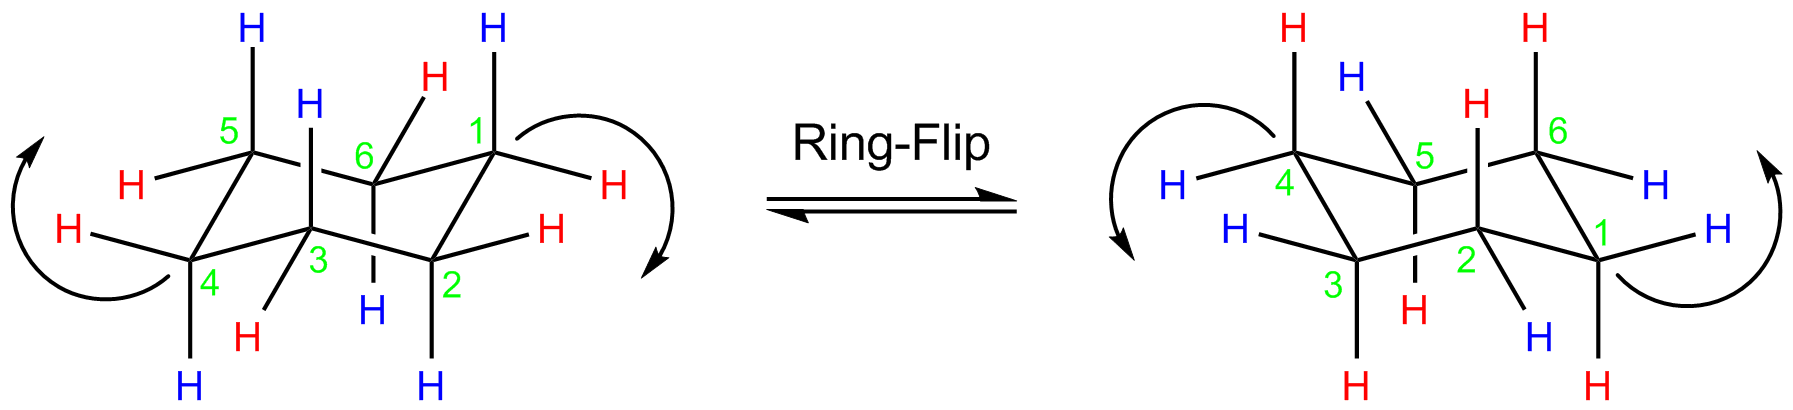 Cyclohexane Chair Ring Flip